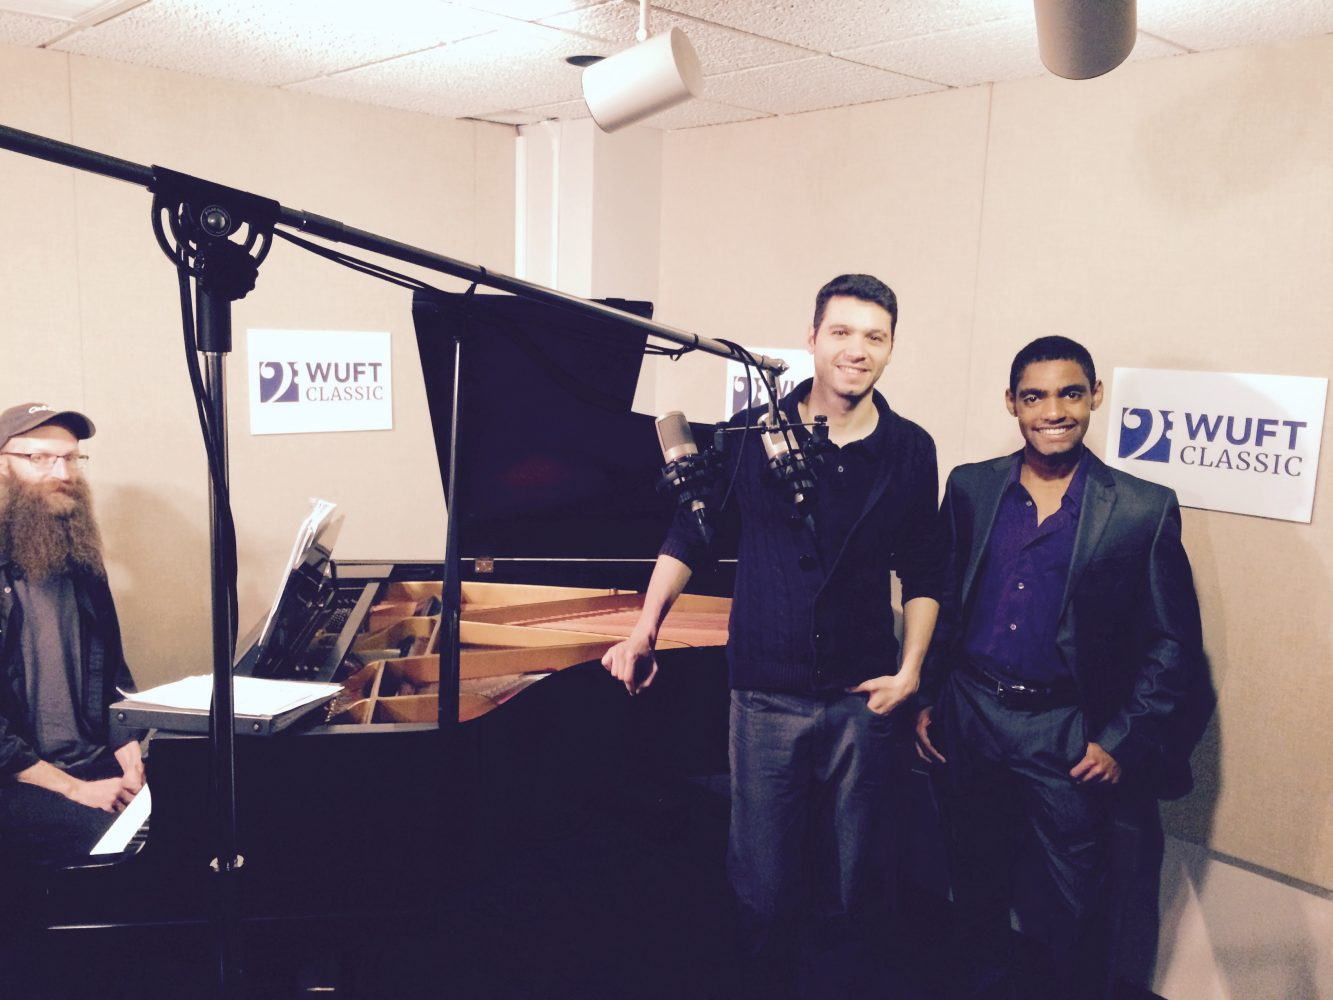 Splendor' Singers Perform On WUFT Classic – WUFT News